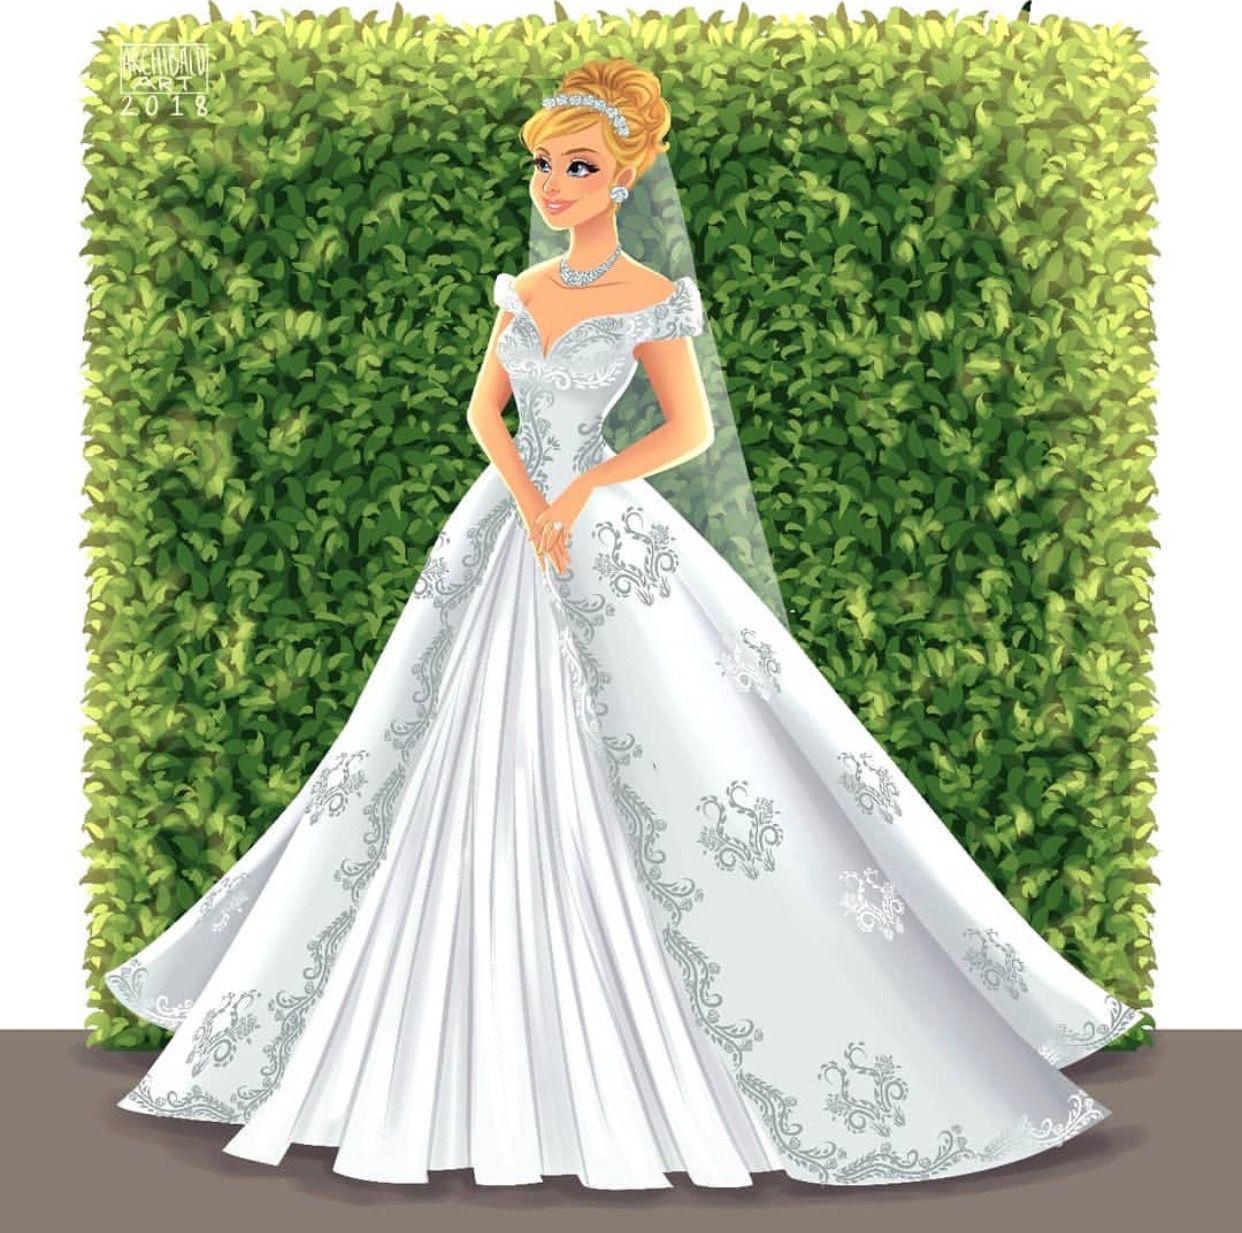 Greco archibald disney princesses x modern brides